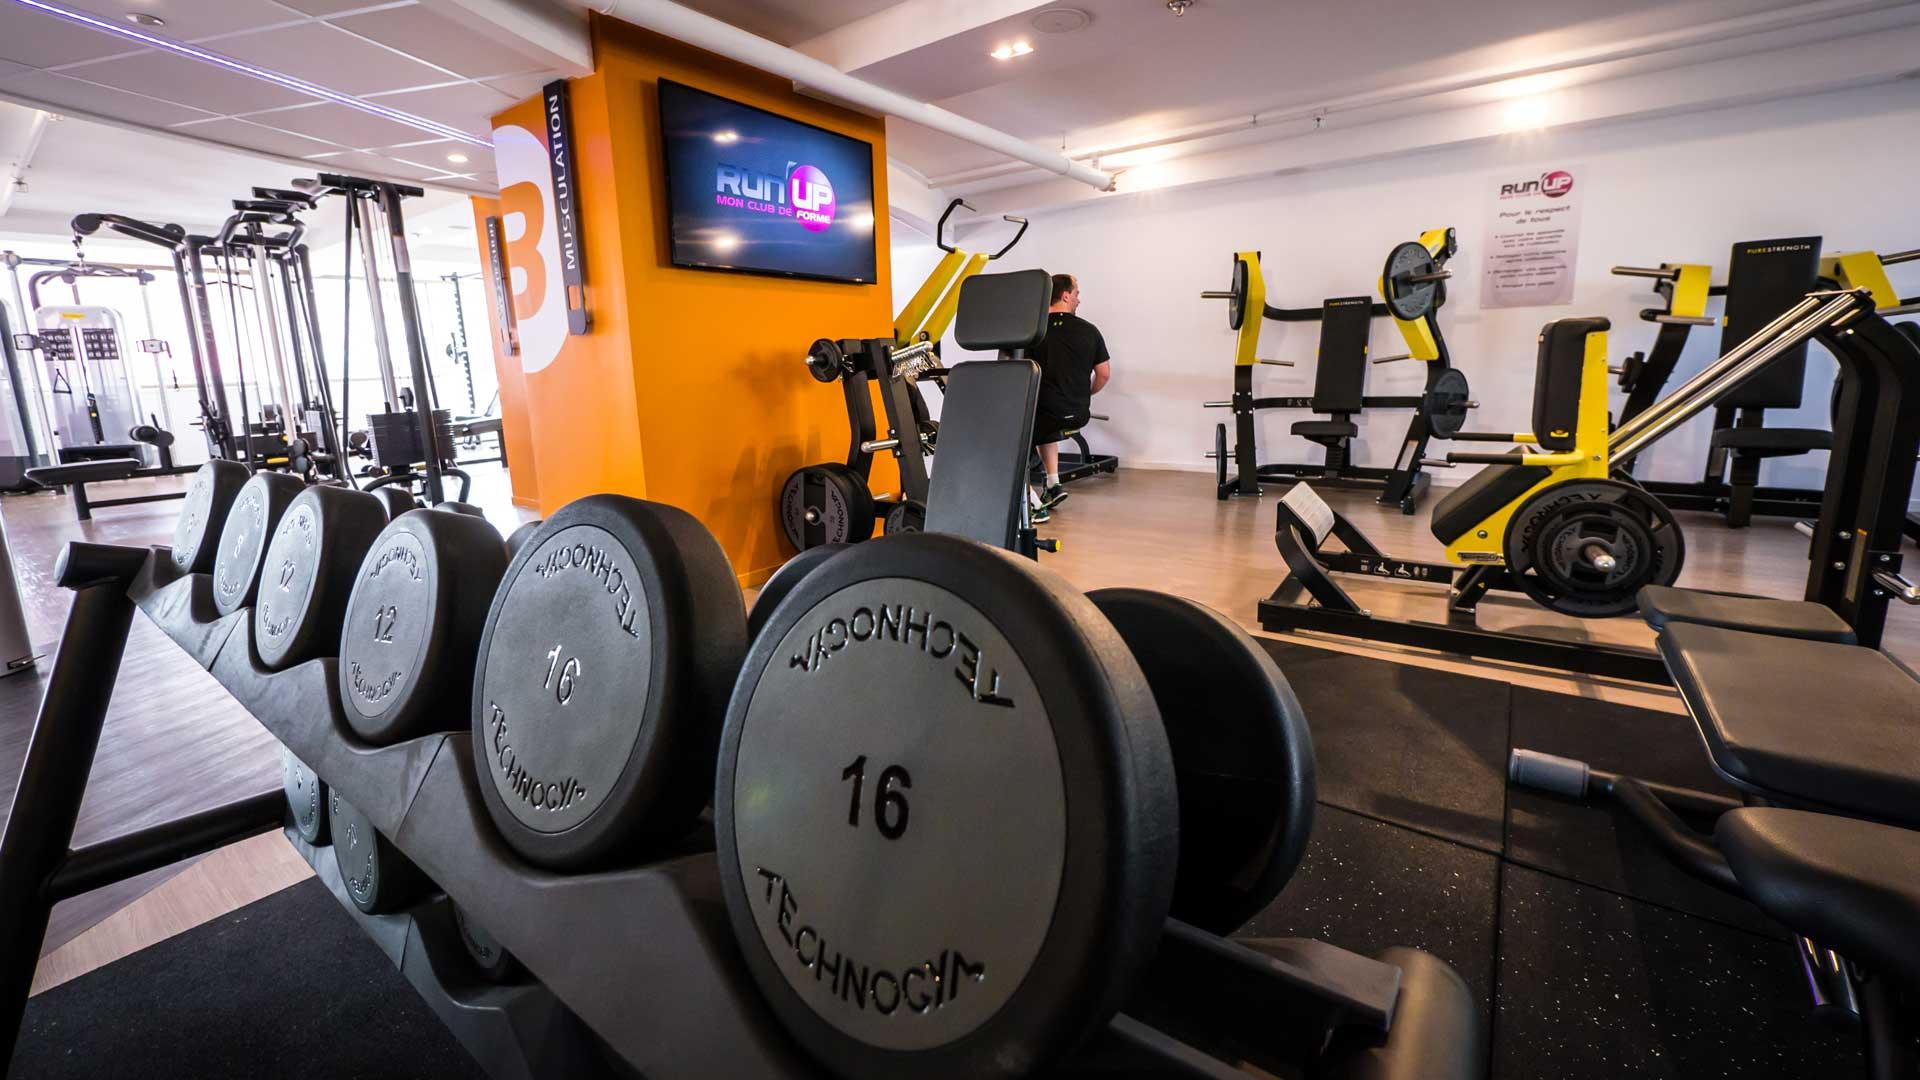 Salle De Sport Nimes Centre Fitness Musculation Cardio Club De